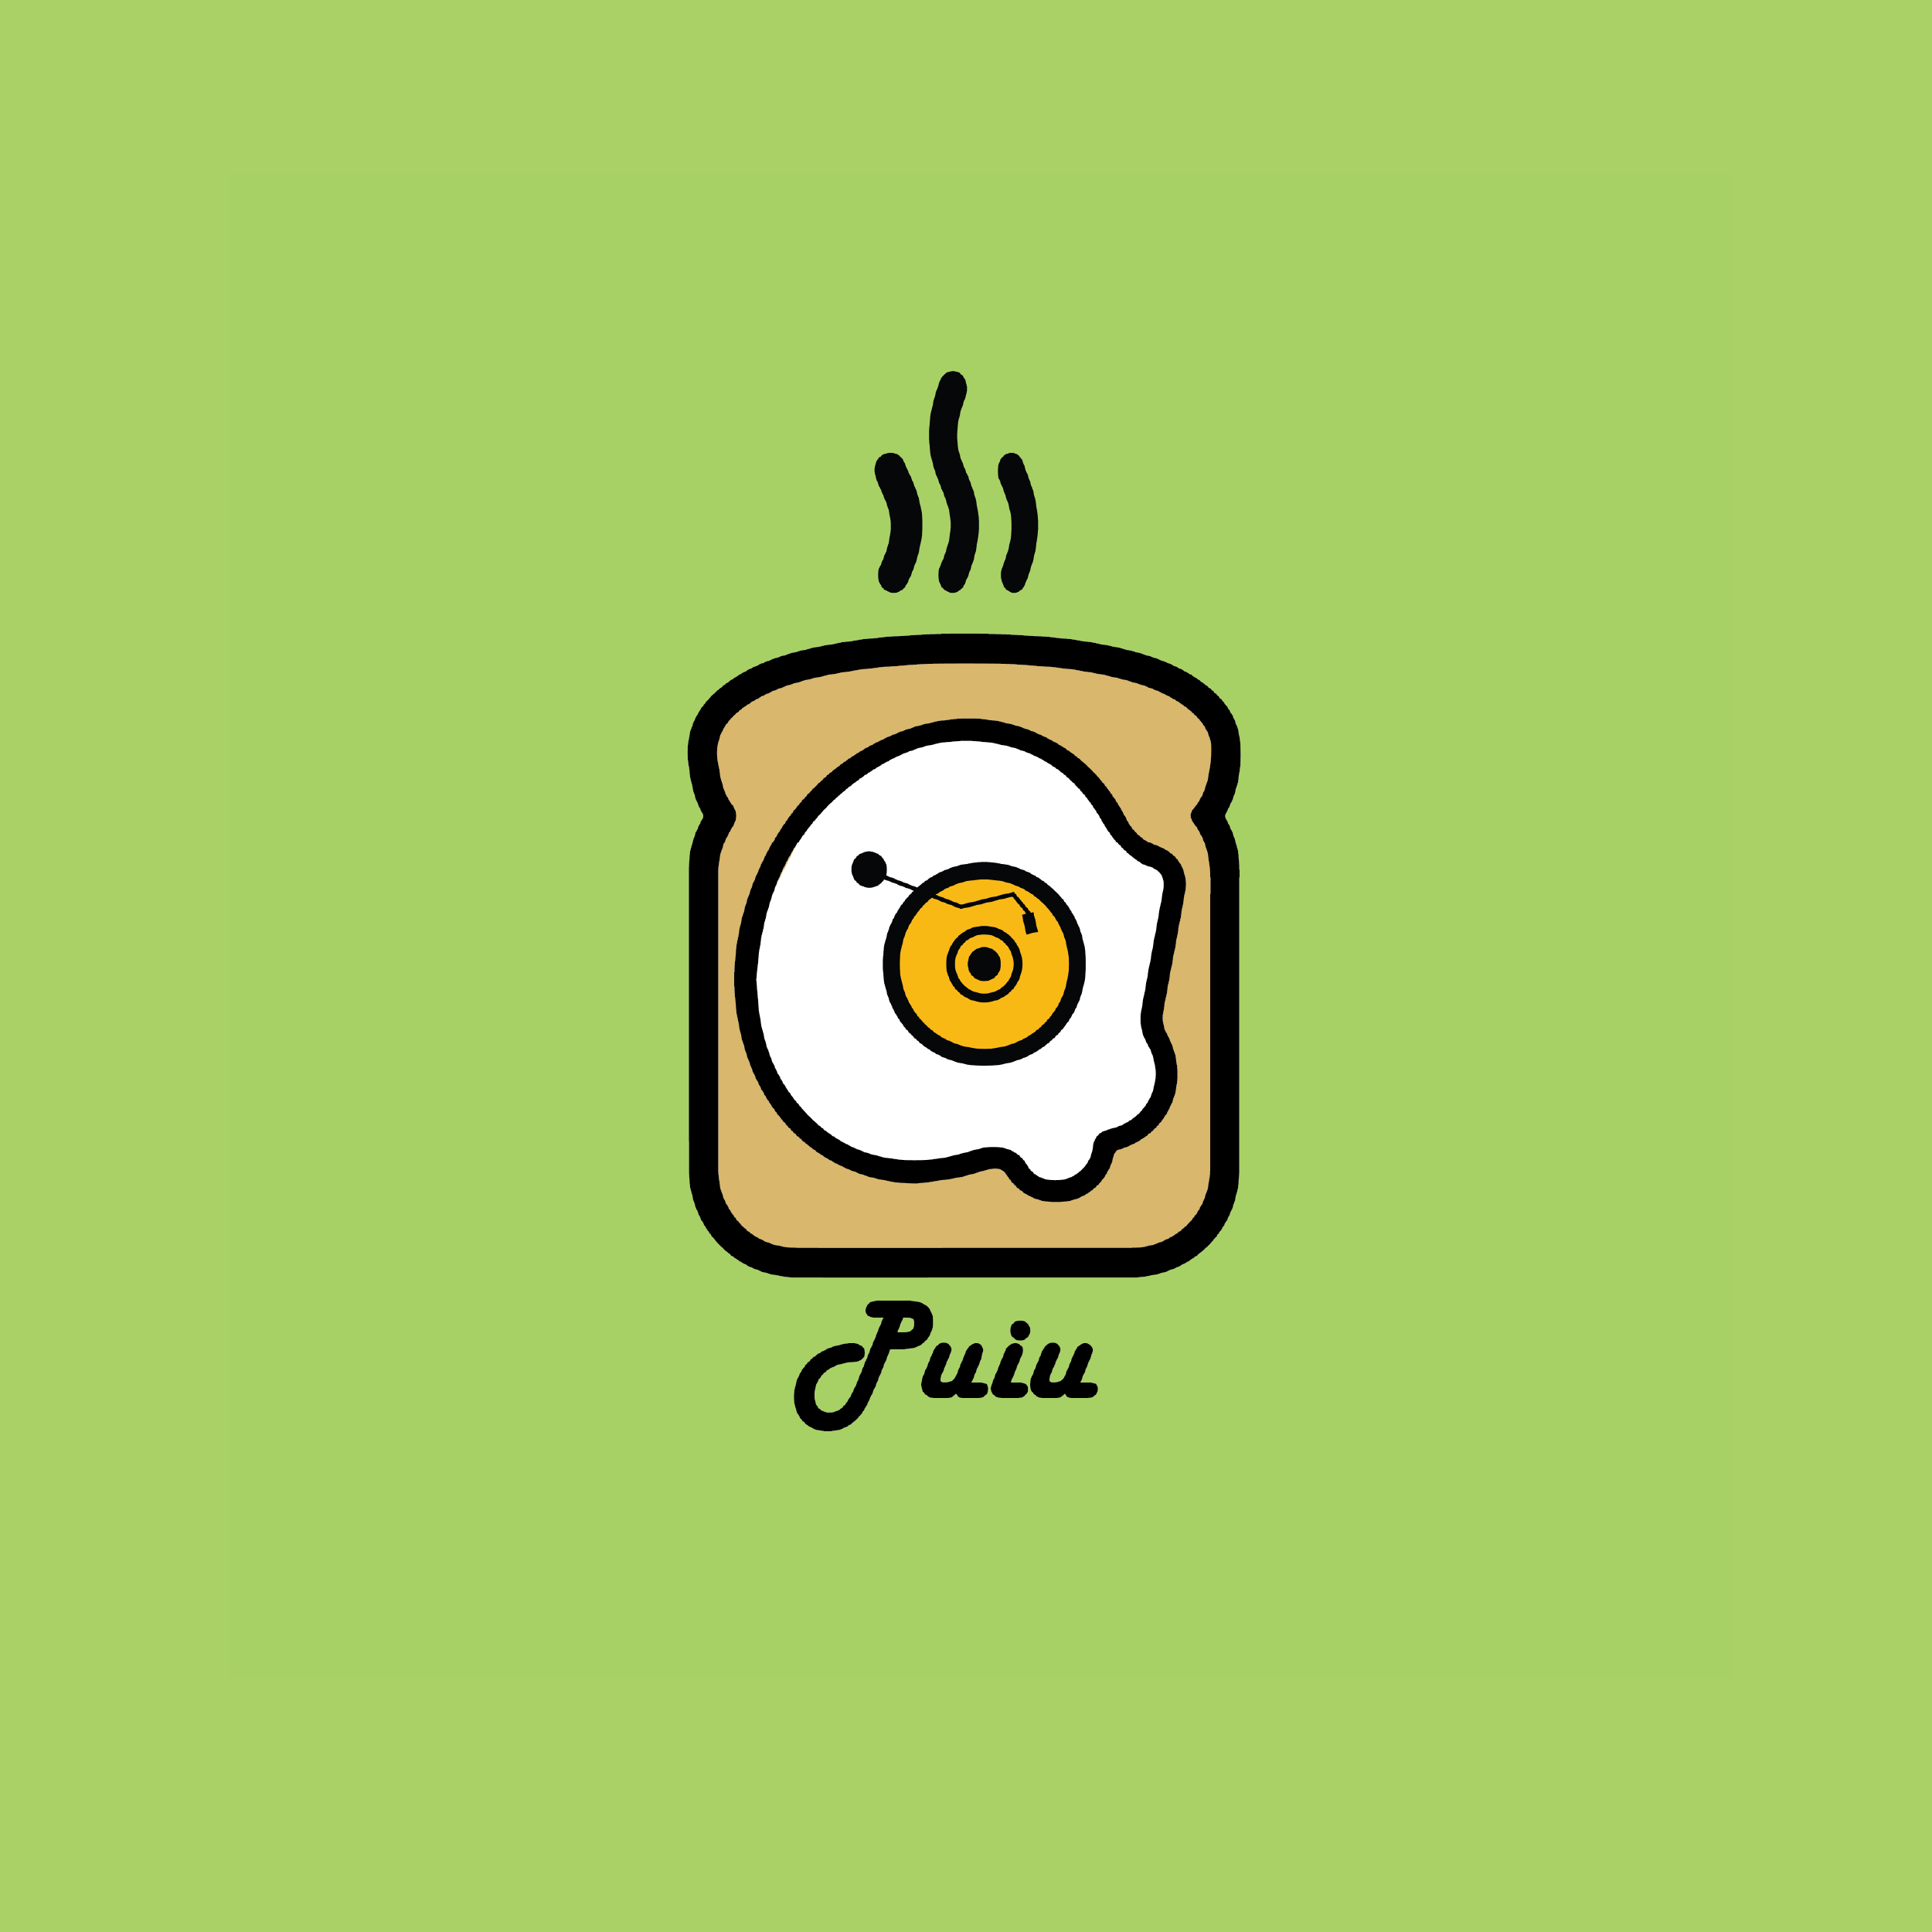 PUIU - SOUL FOOD |  Andrei Puiu